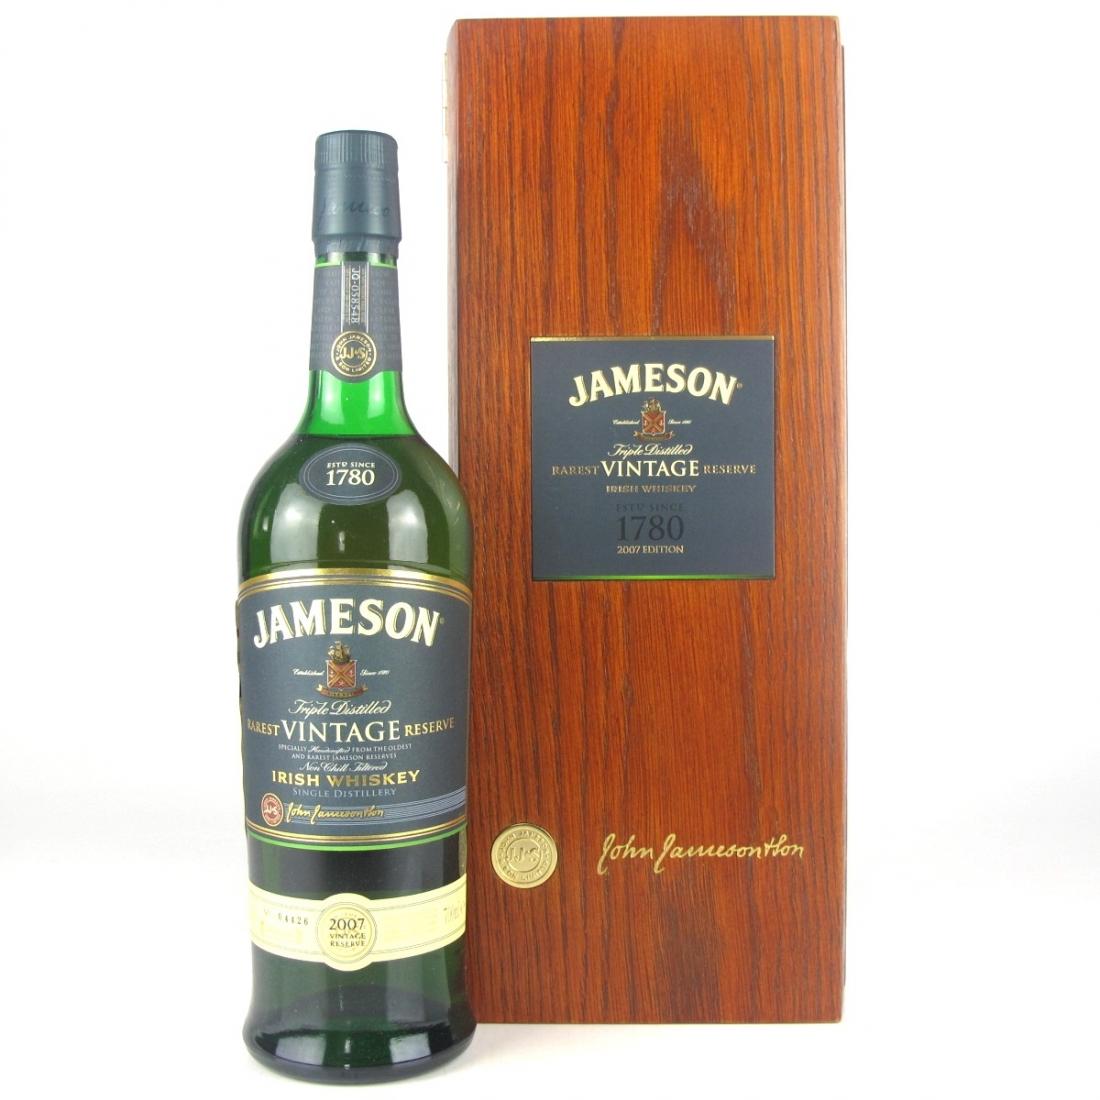 Jameson 2007 Rarest Vintage Reserve